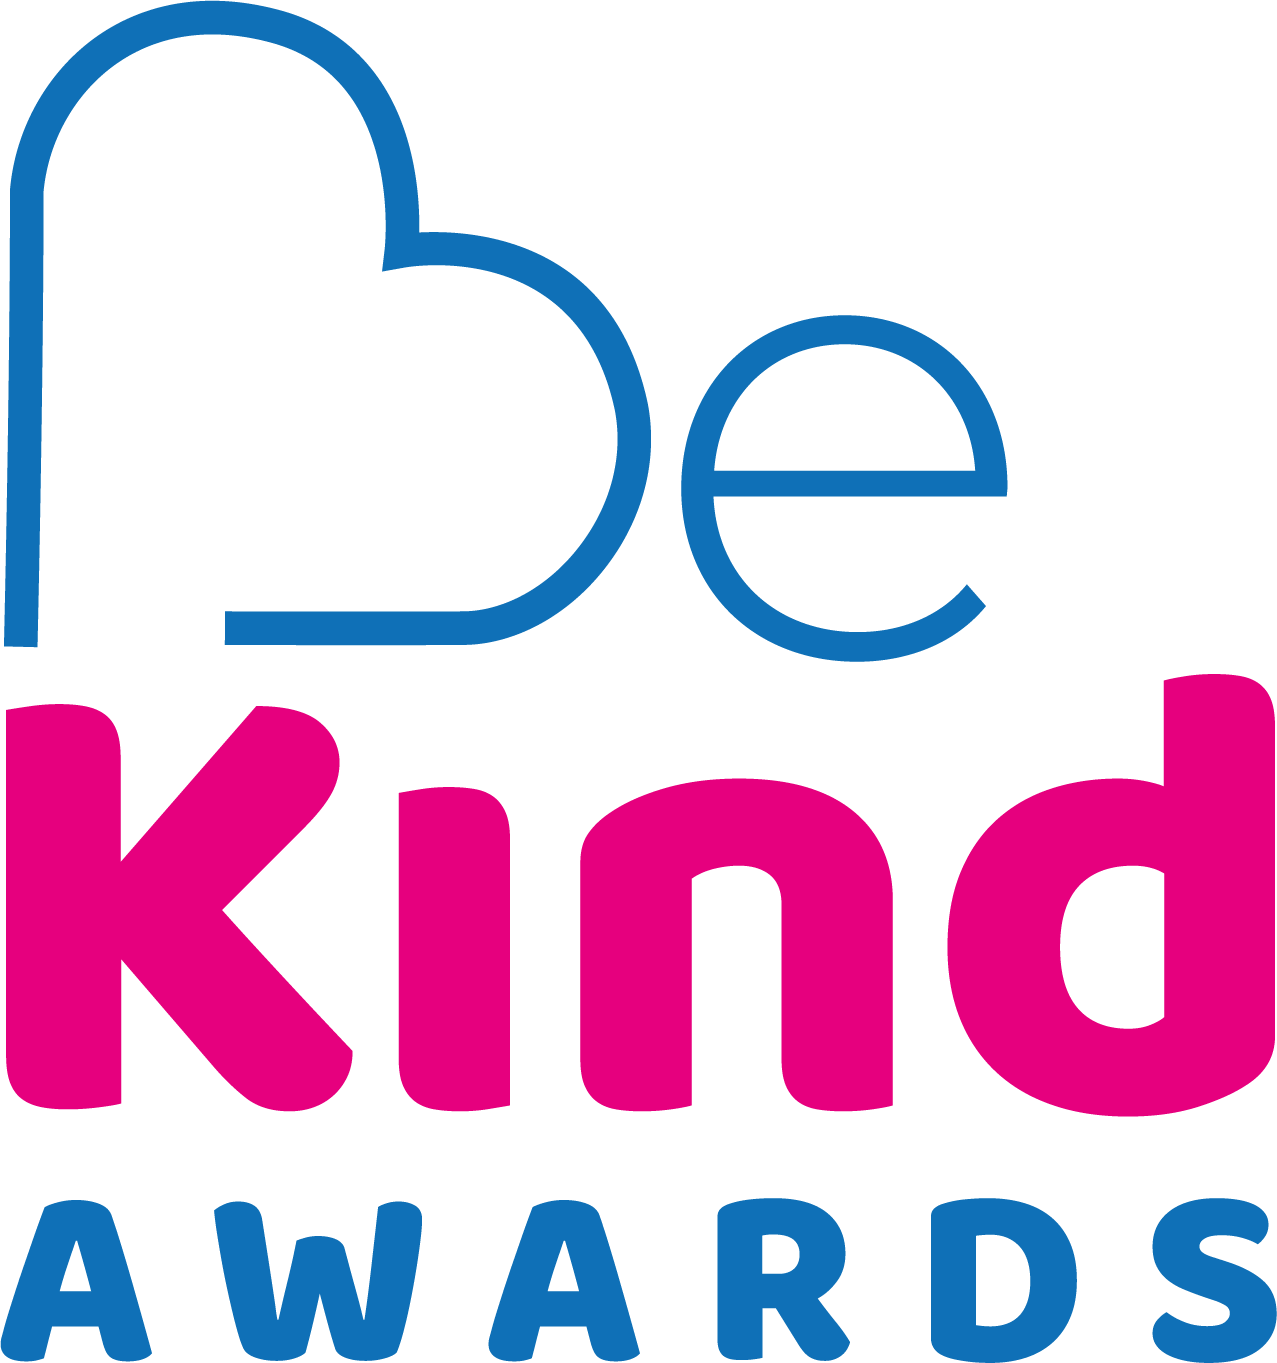 Be Kind Awards